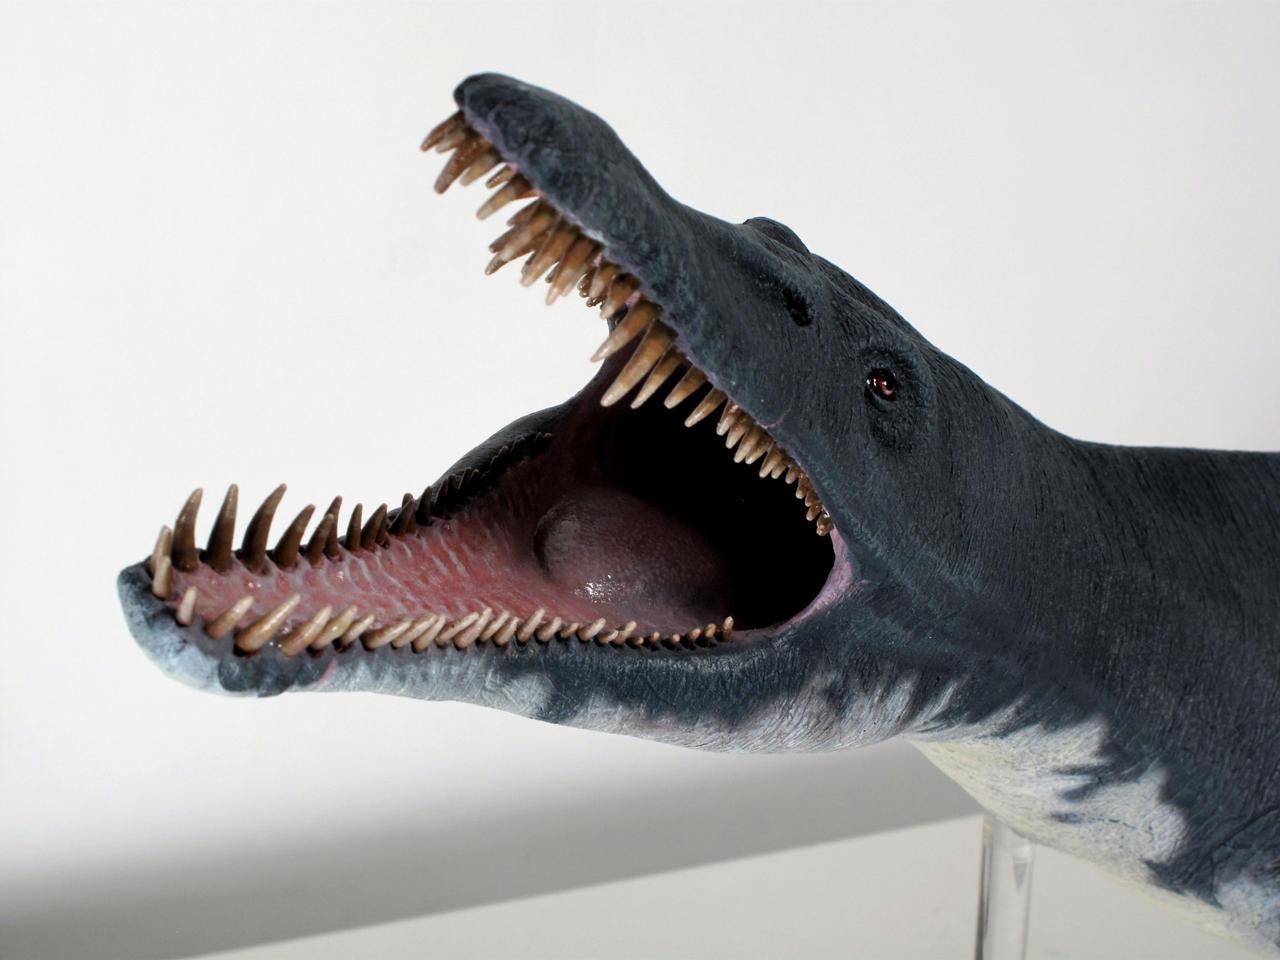 Pliosaurus macromerus 2 by Thomasotom